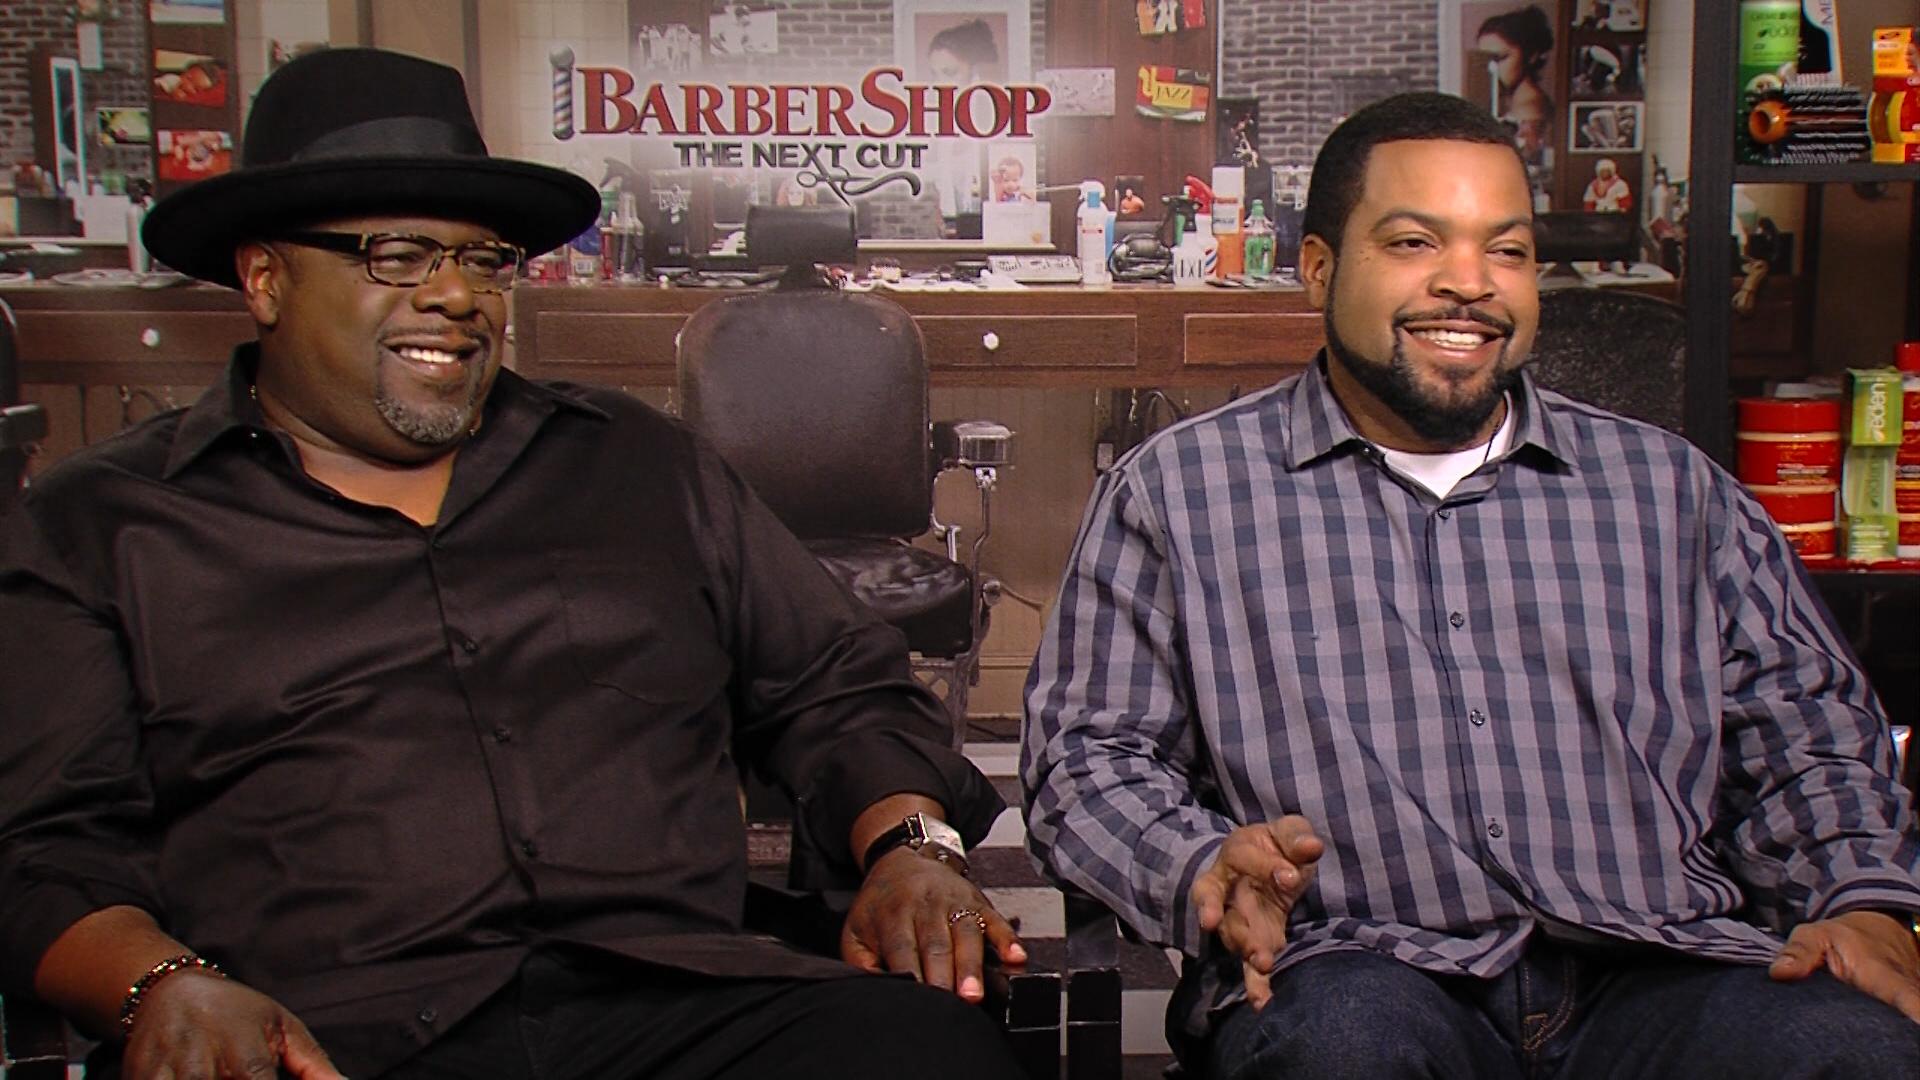 Download Film Barbershop Next Cut 2016